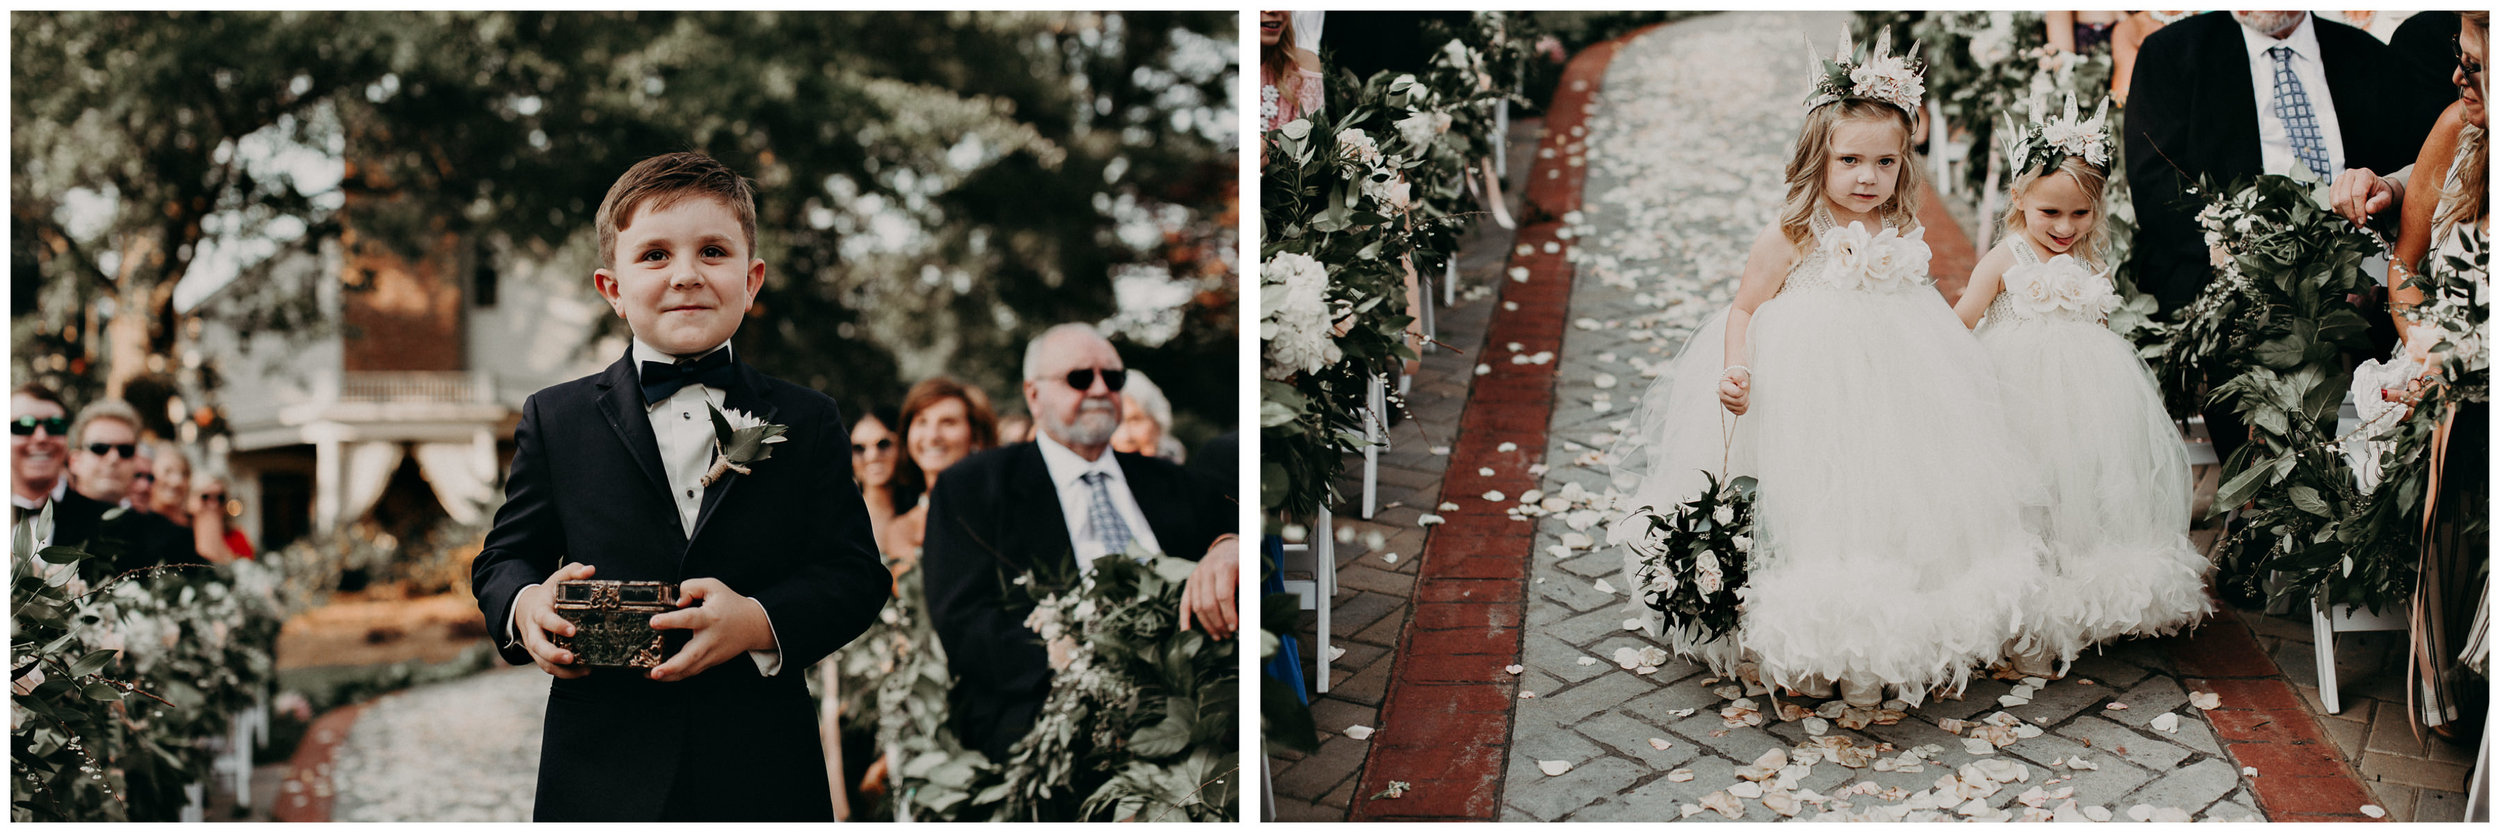 66Carl House Wedding Venue Ga, Atlanta Wedding Photographer - Boho, Bohemian, Junebug Weddings, Vintage, Retro, Trendy. Aline Marin Photography. .jpg